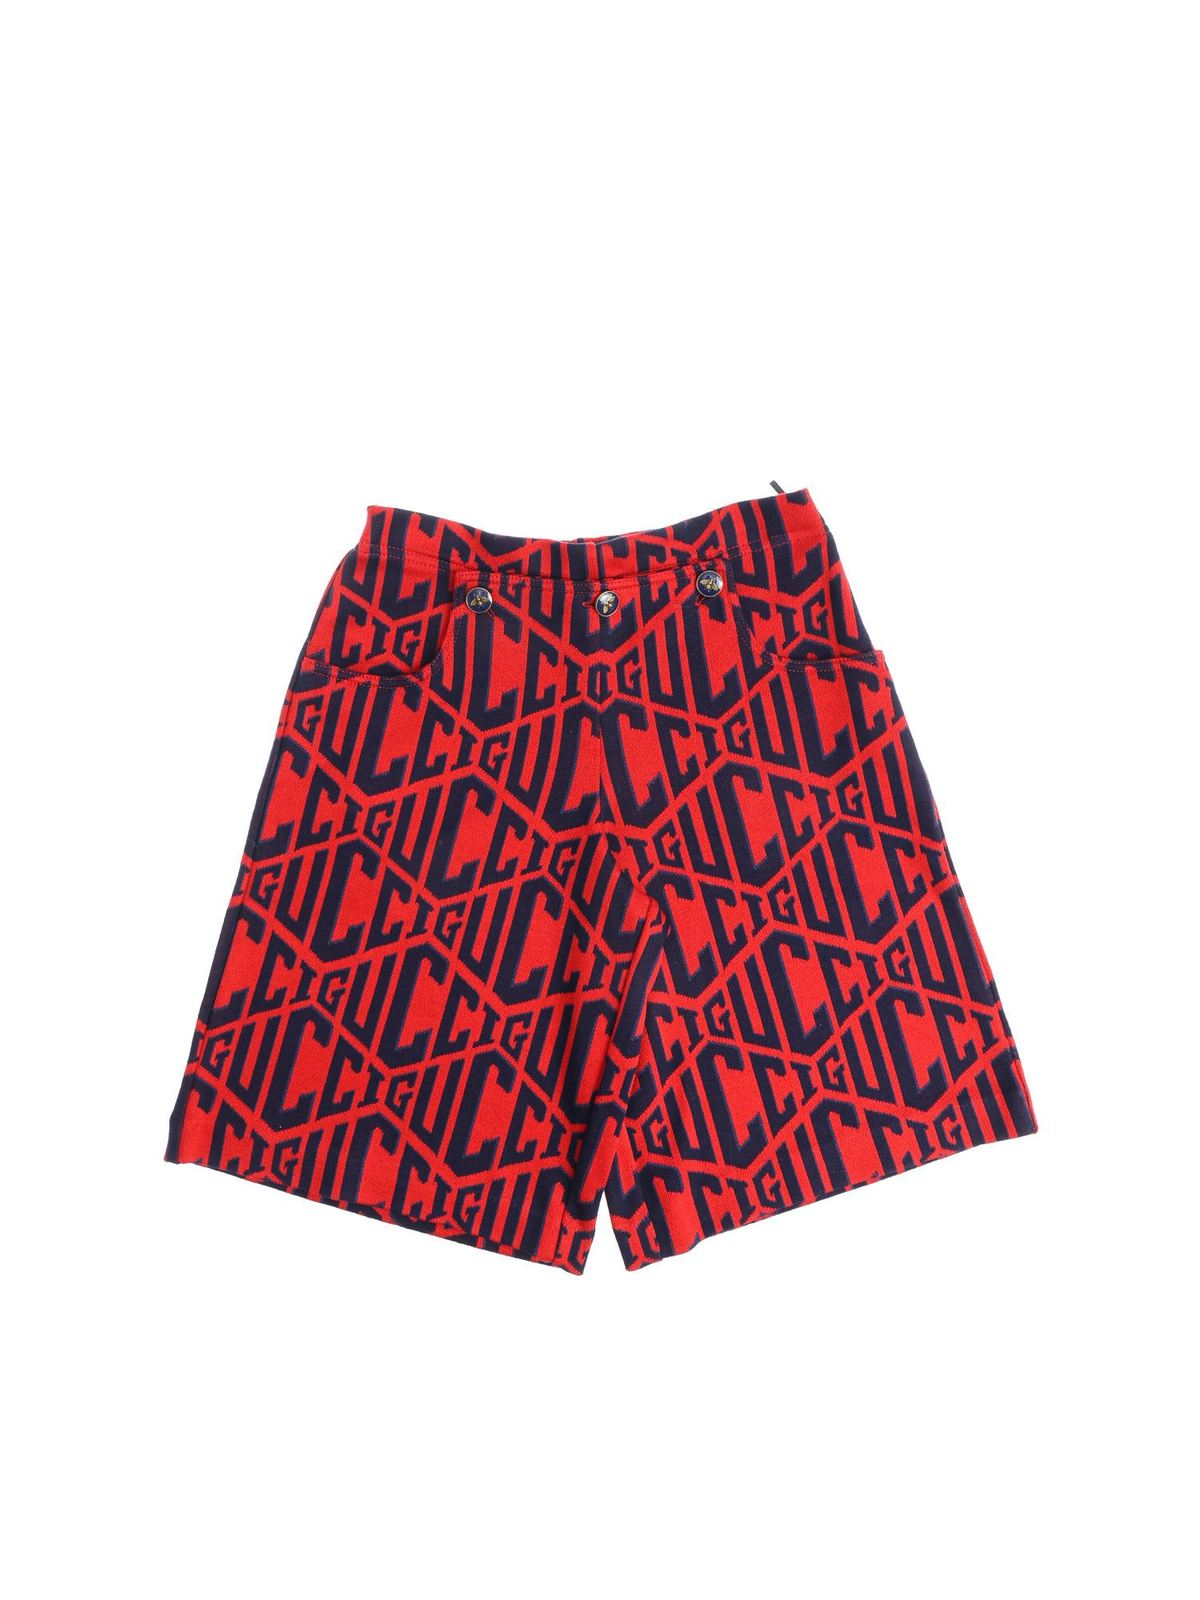 Gucci Kids' Monogram Red Pants